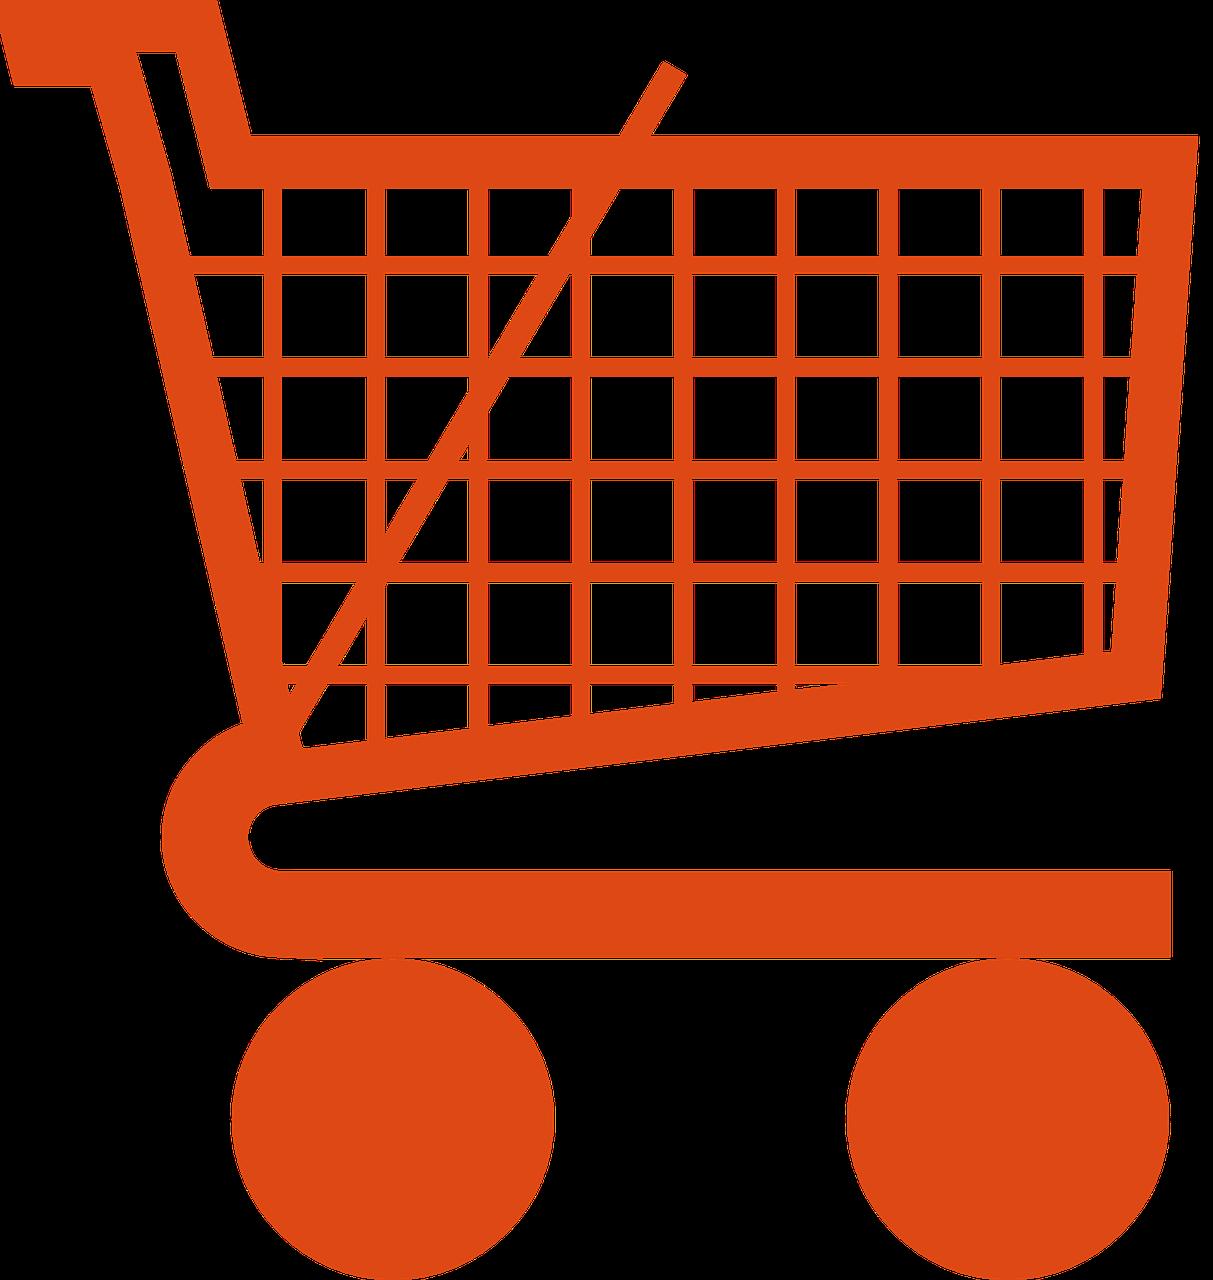 Shopping Cart Holiday Online Shopping Supermarket Shopping Cart